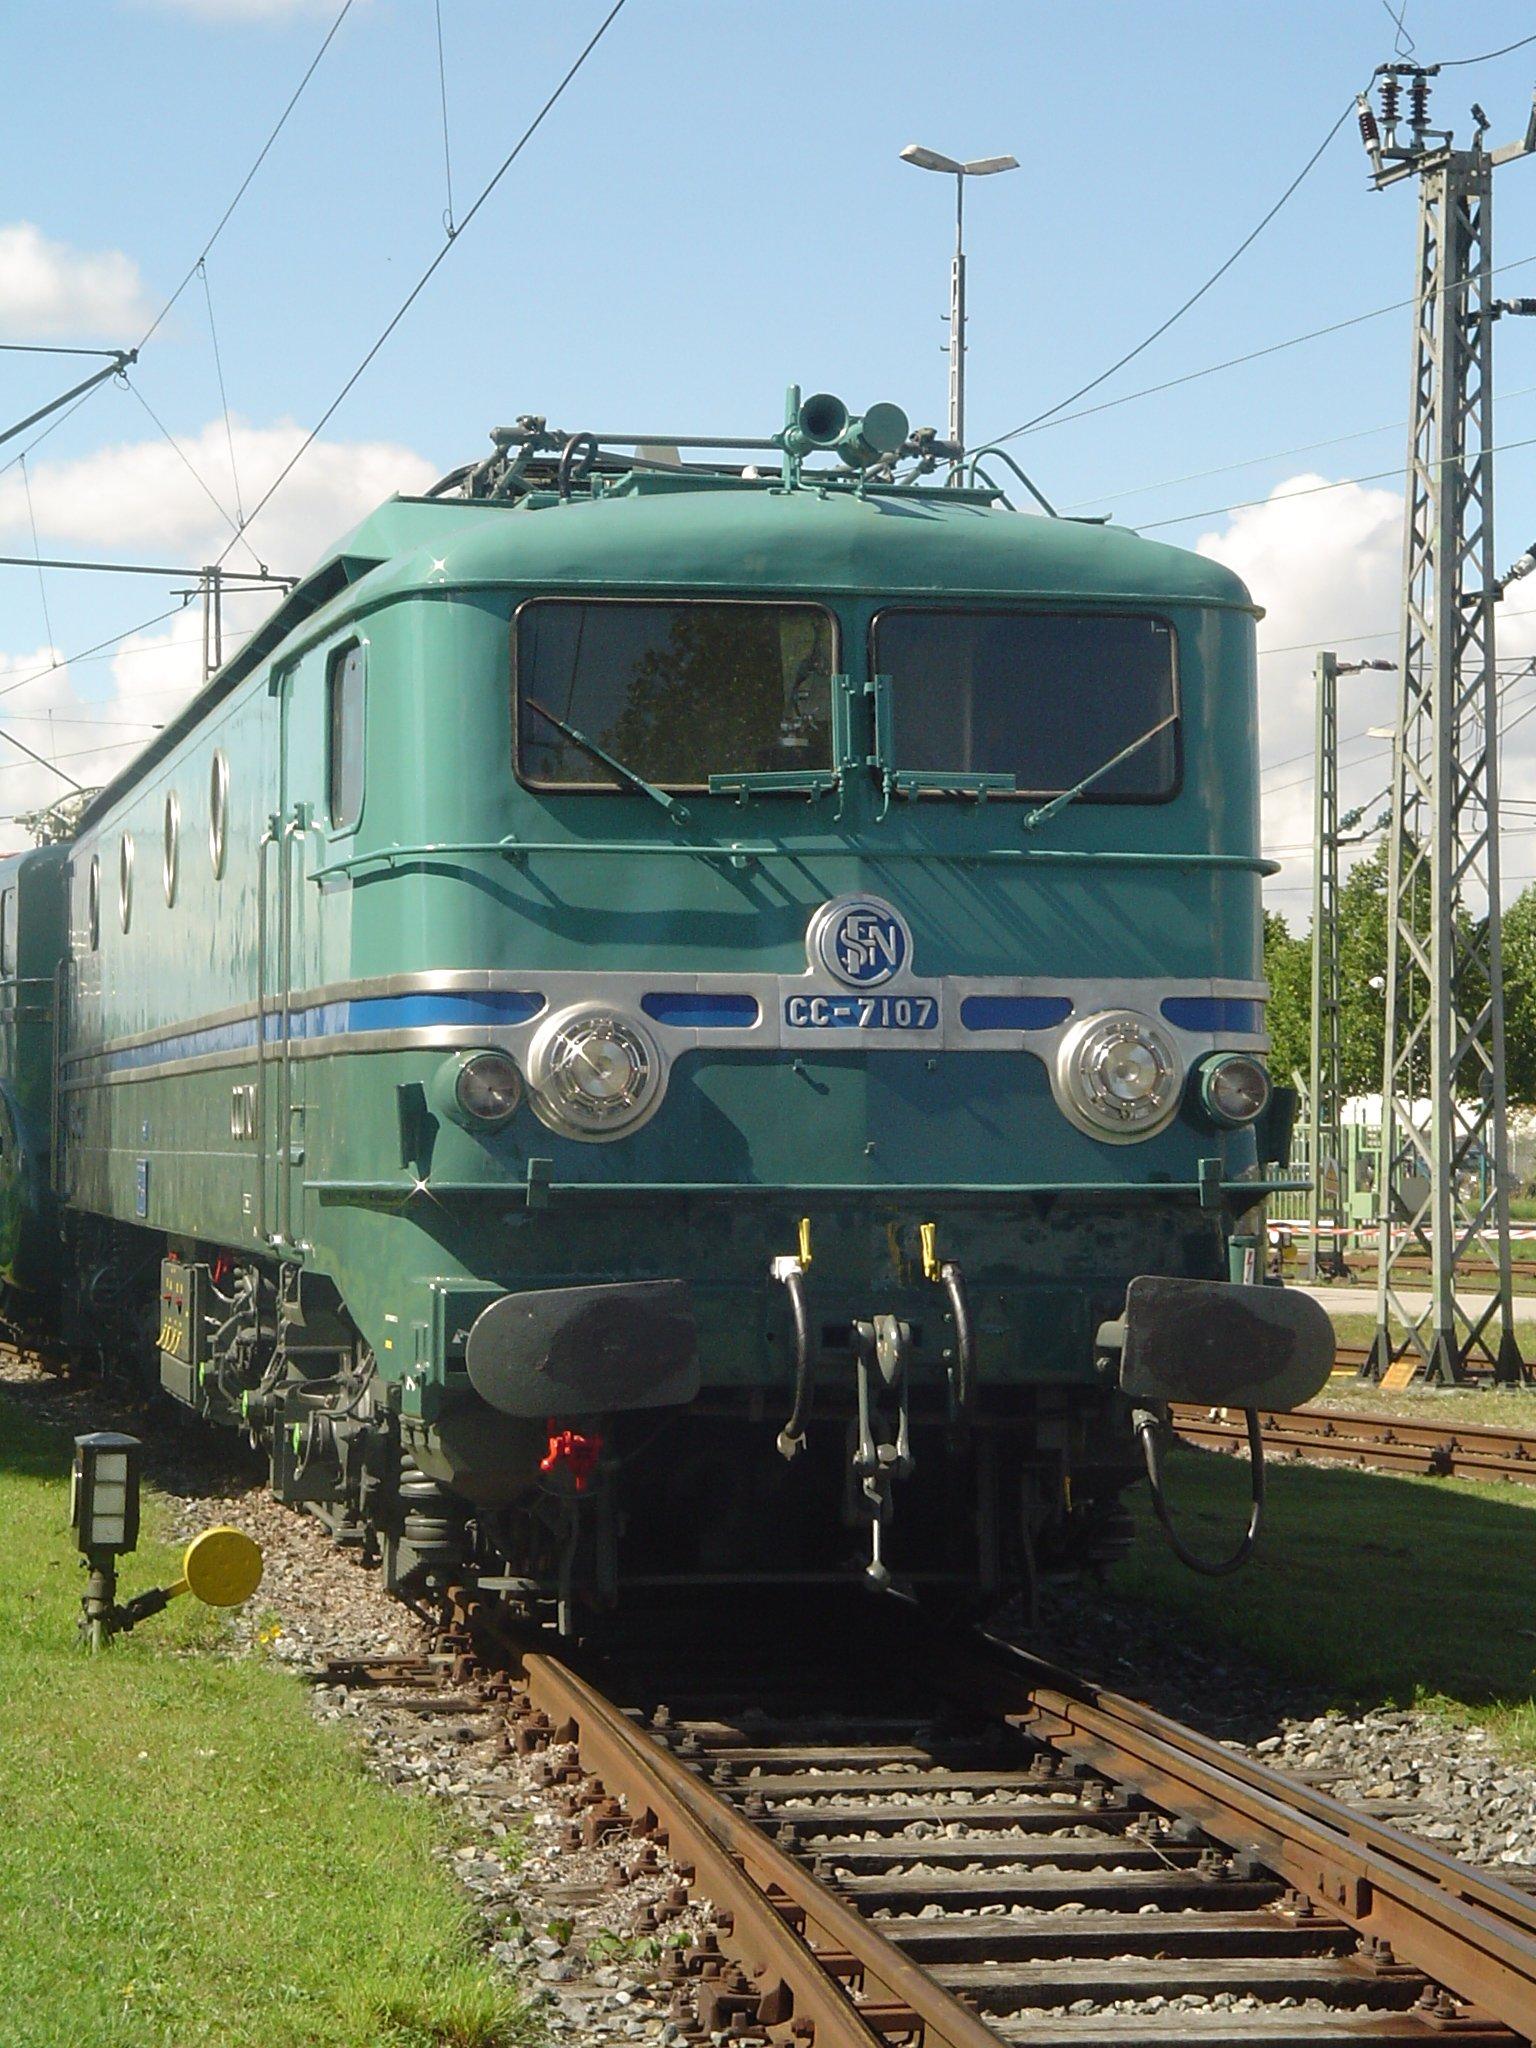 SNCF CC 7100 - Wikipedia